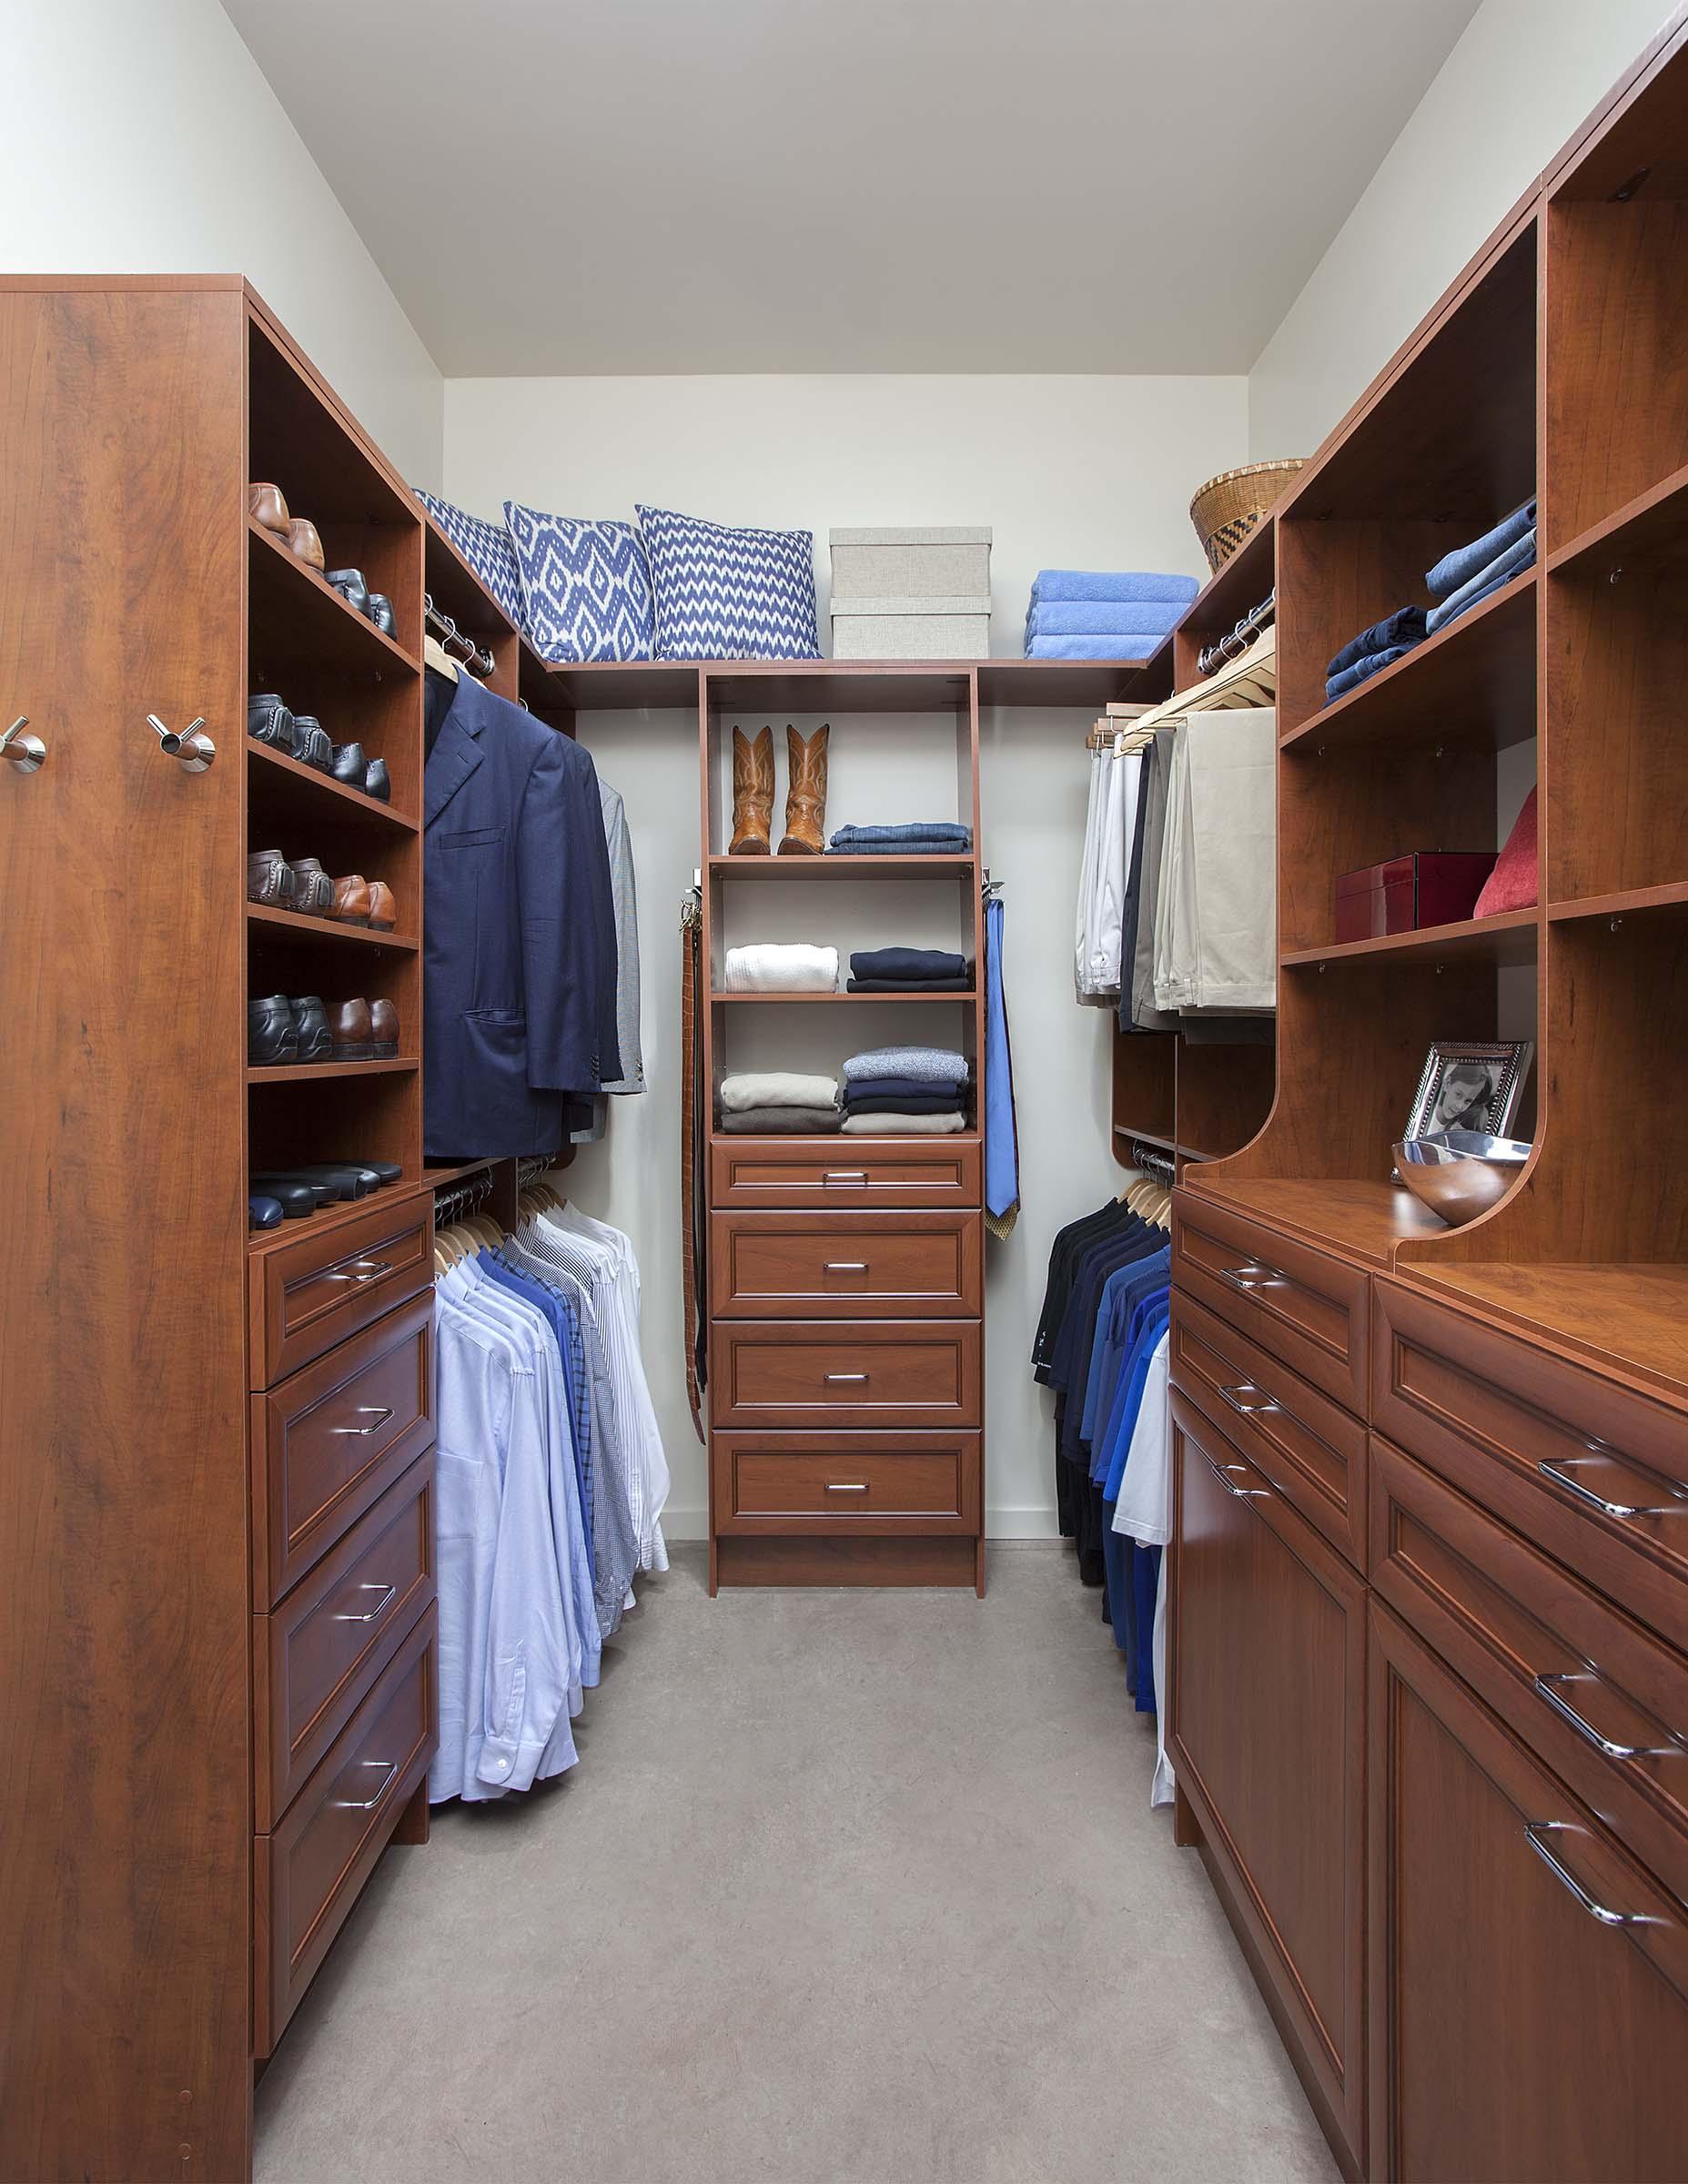 Engrossing Cedar Closet Lining Lowes Design Rings For